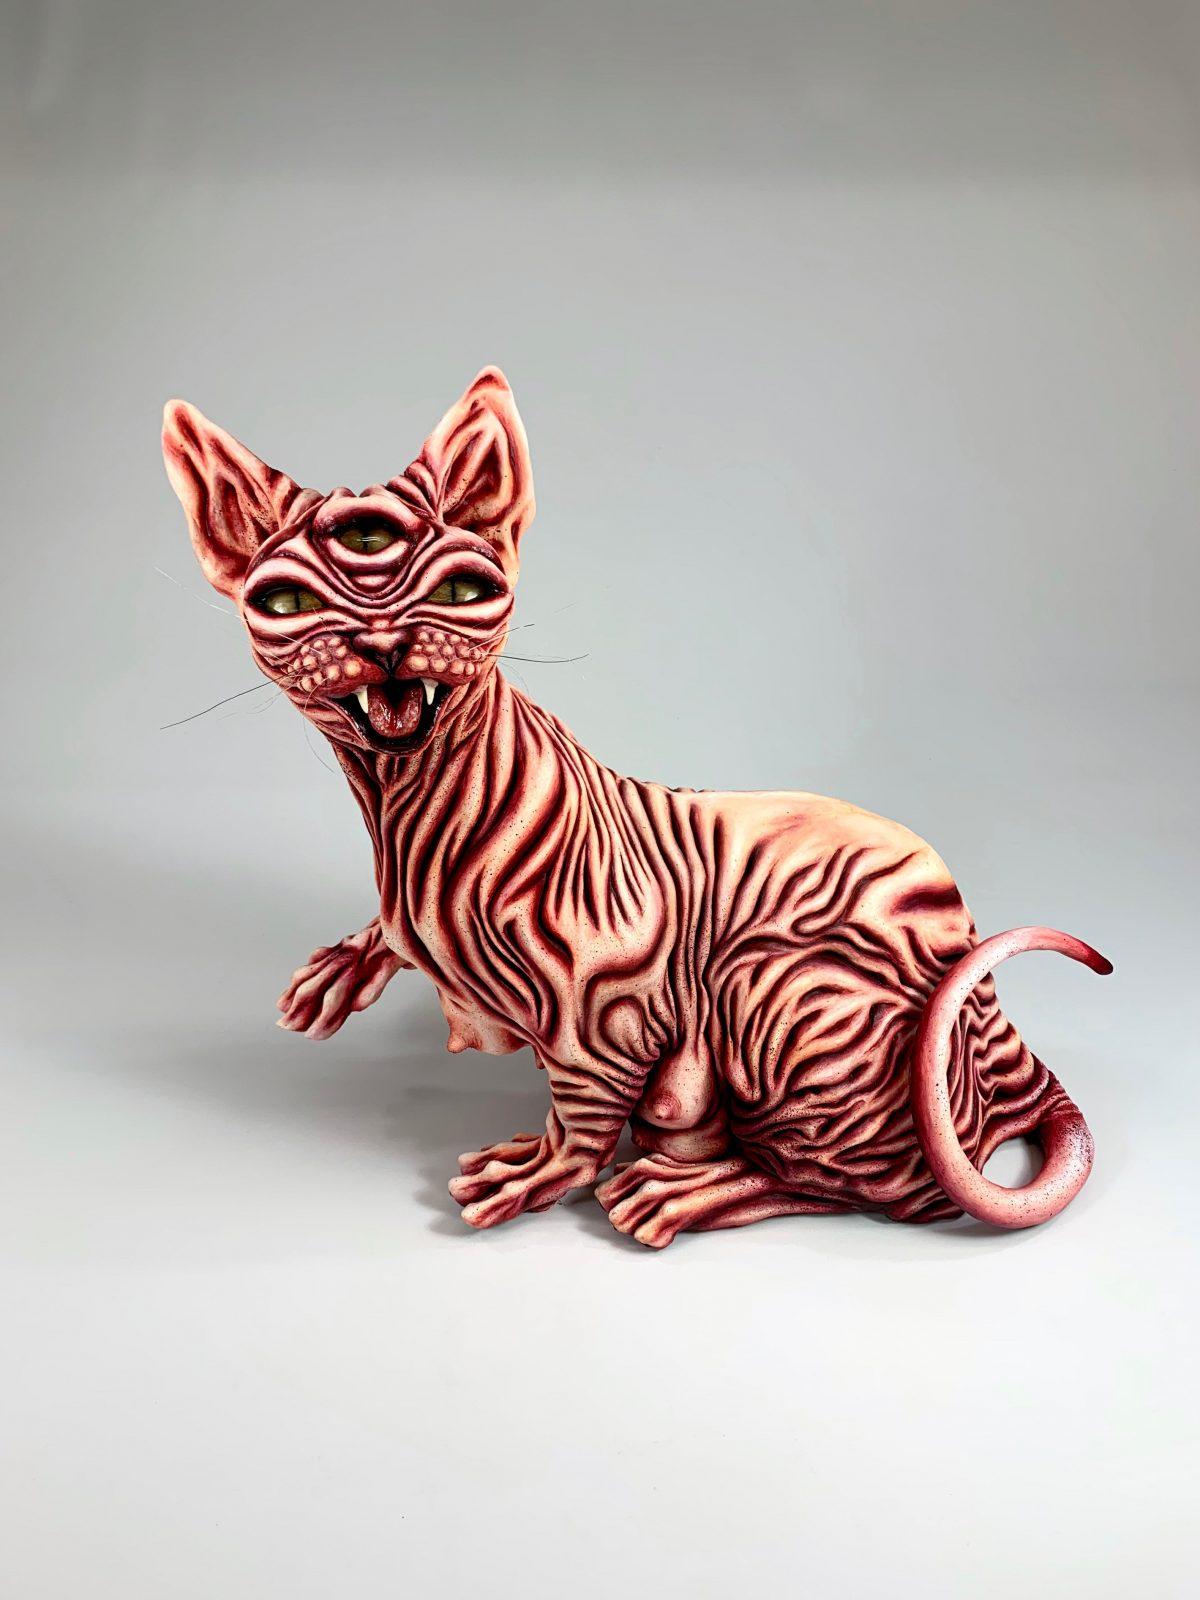 Kimberly Barron's cat sculptured artwork